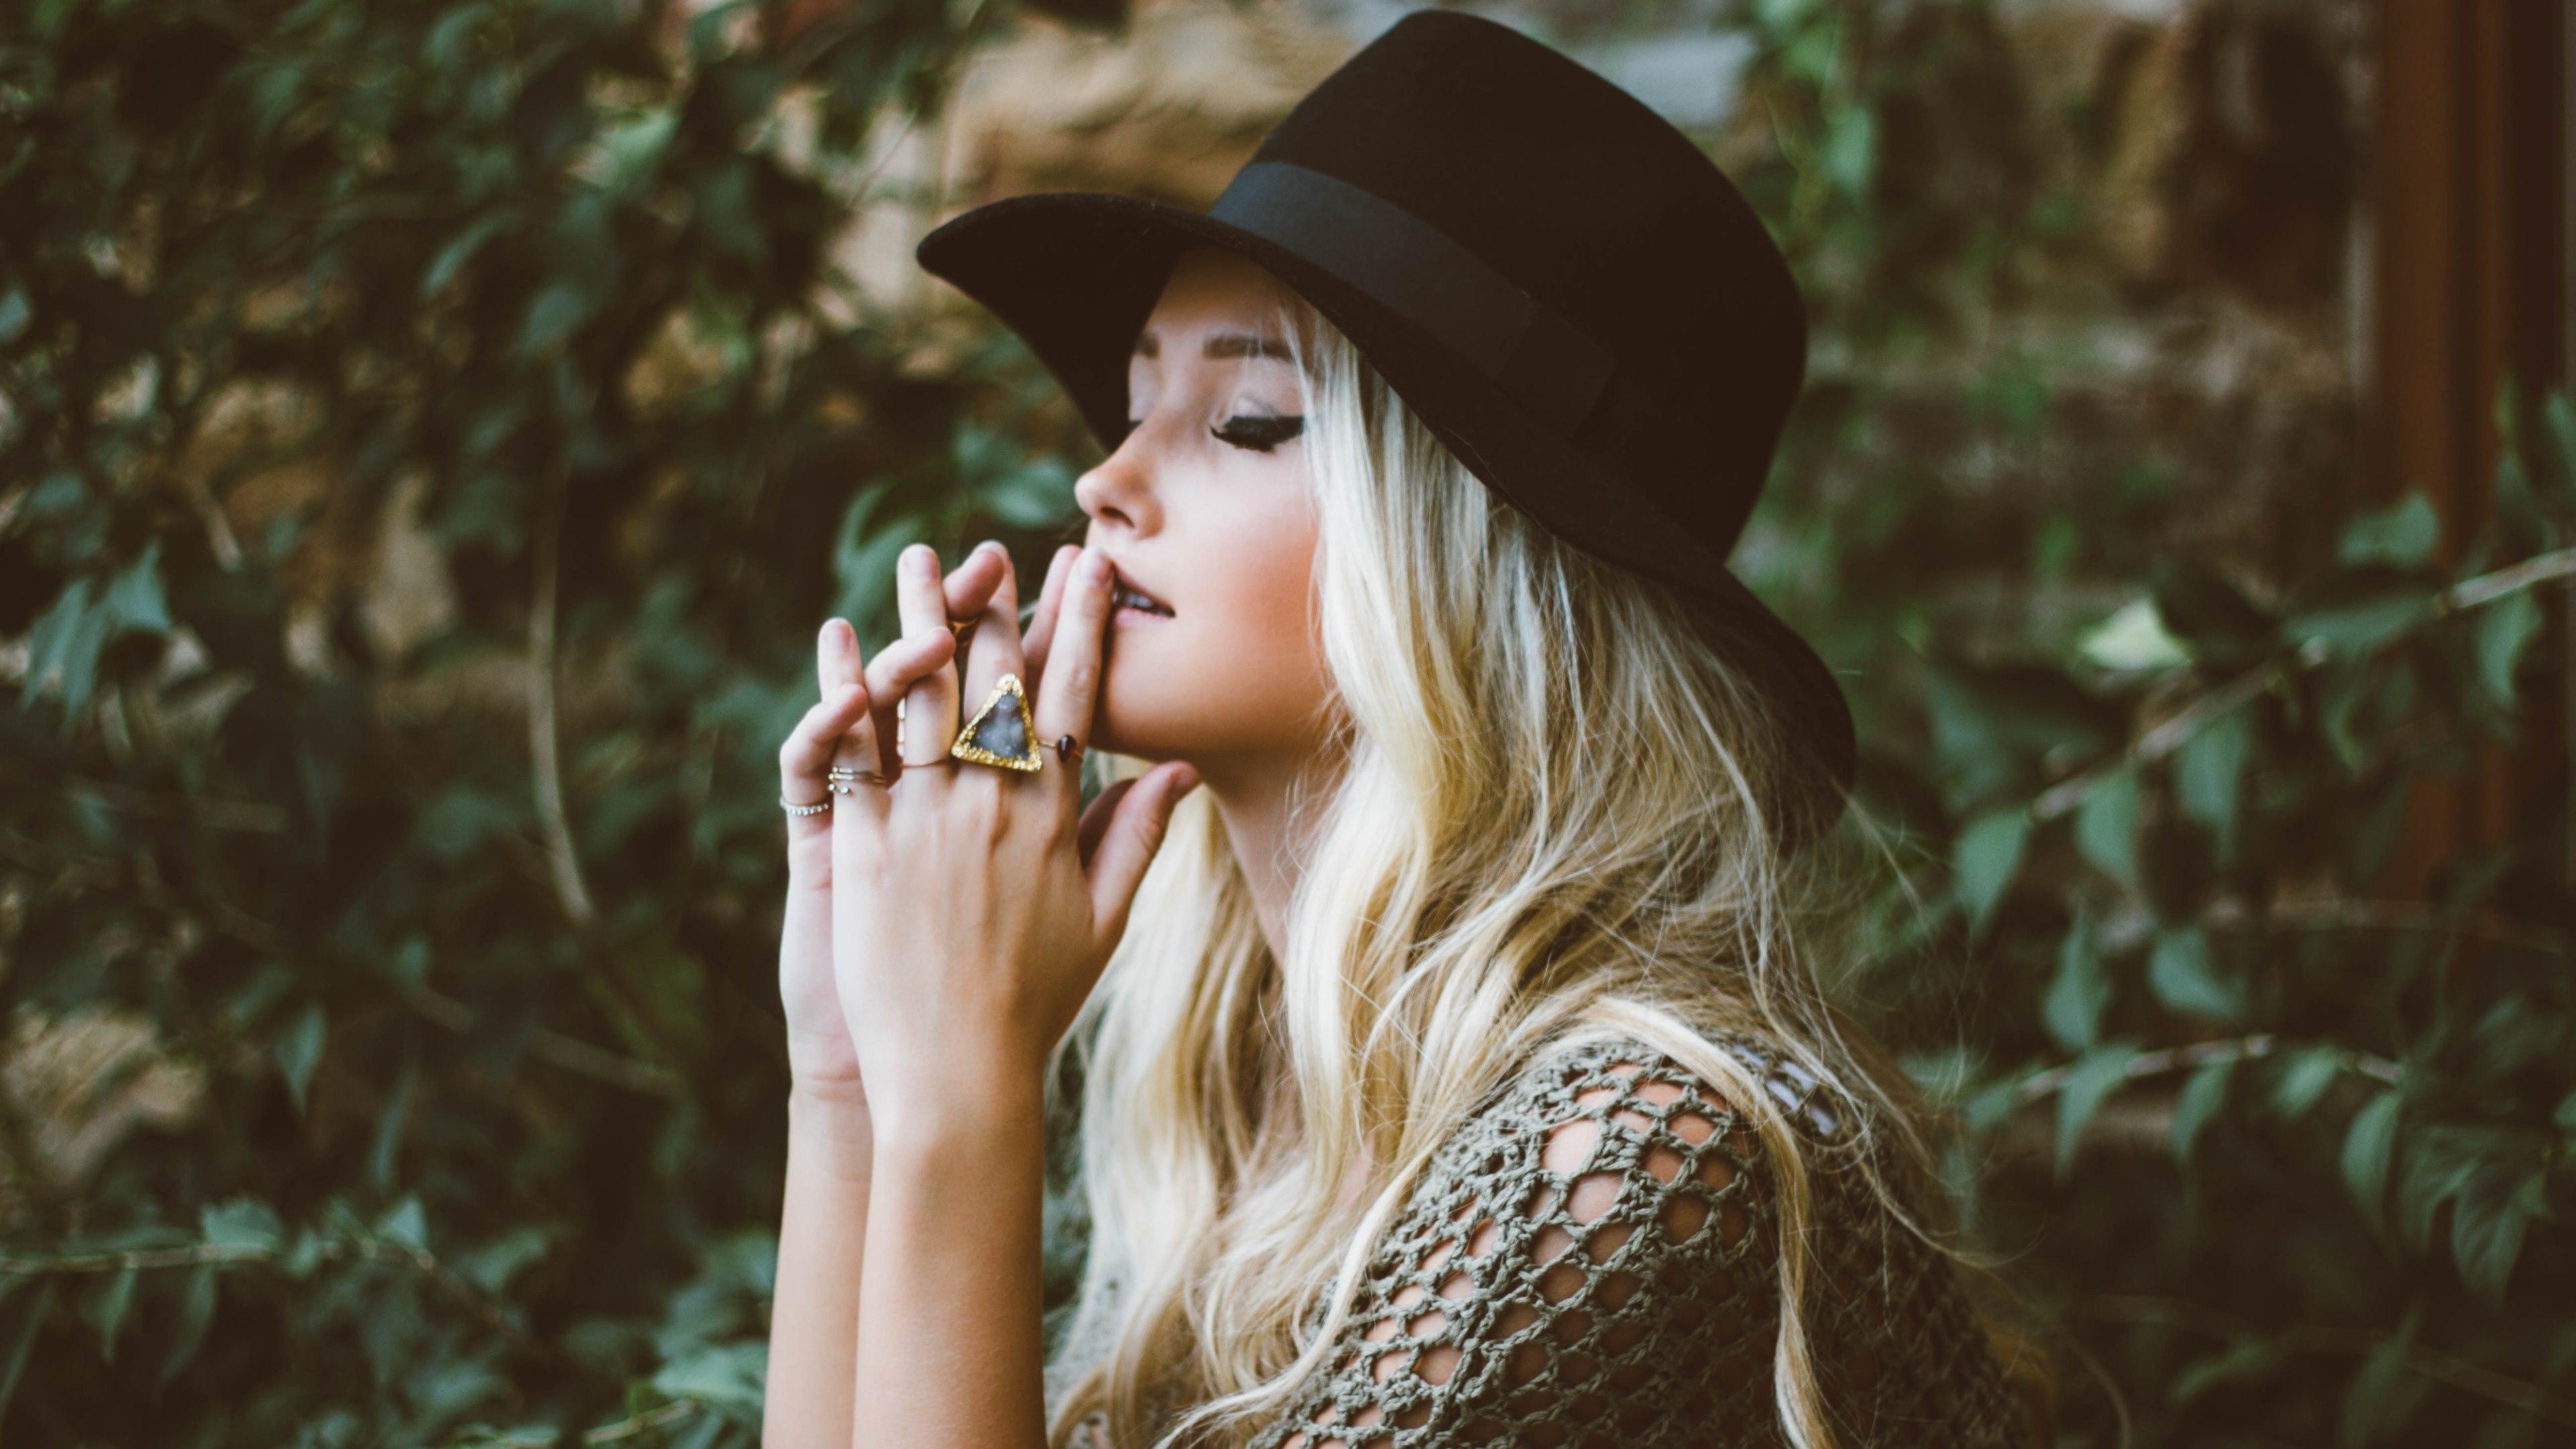 pretty girl wearing a hat 4k ultra hd wallpaper background image